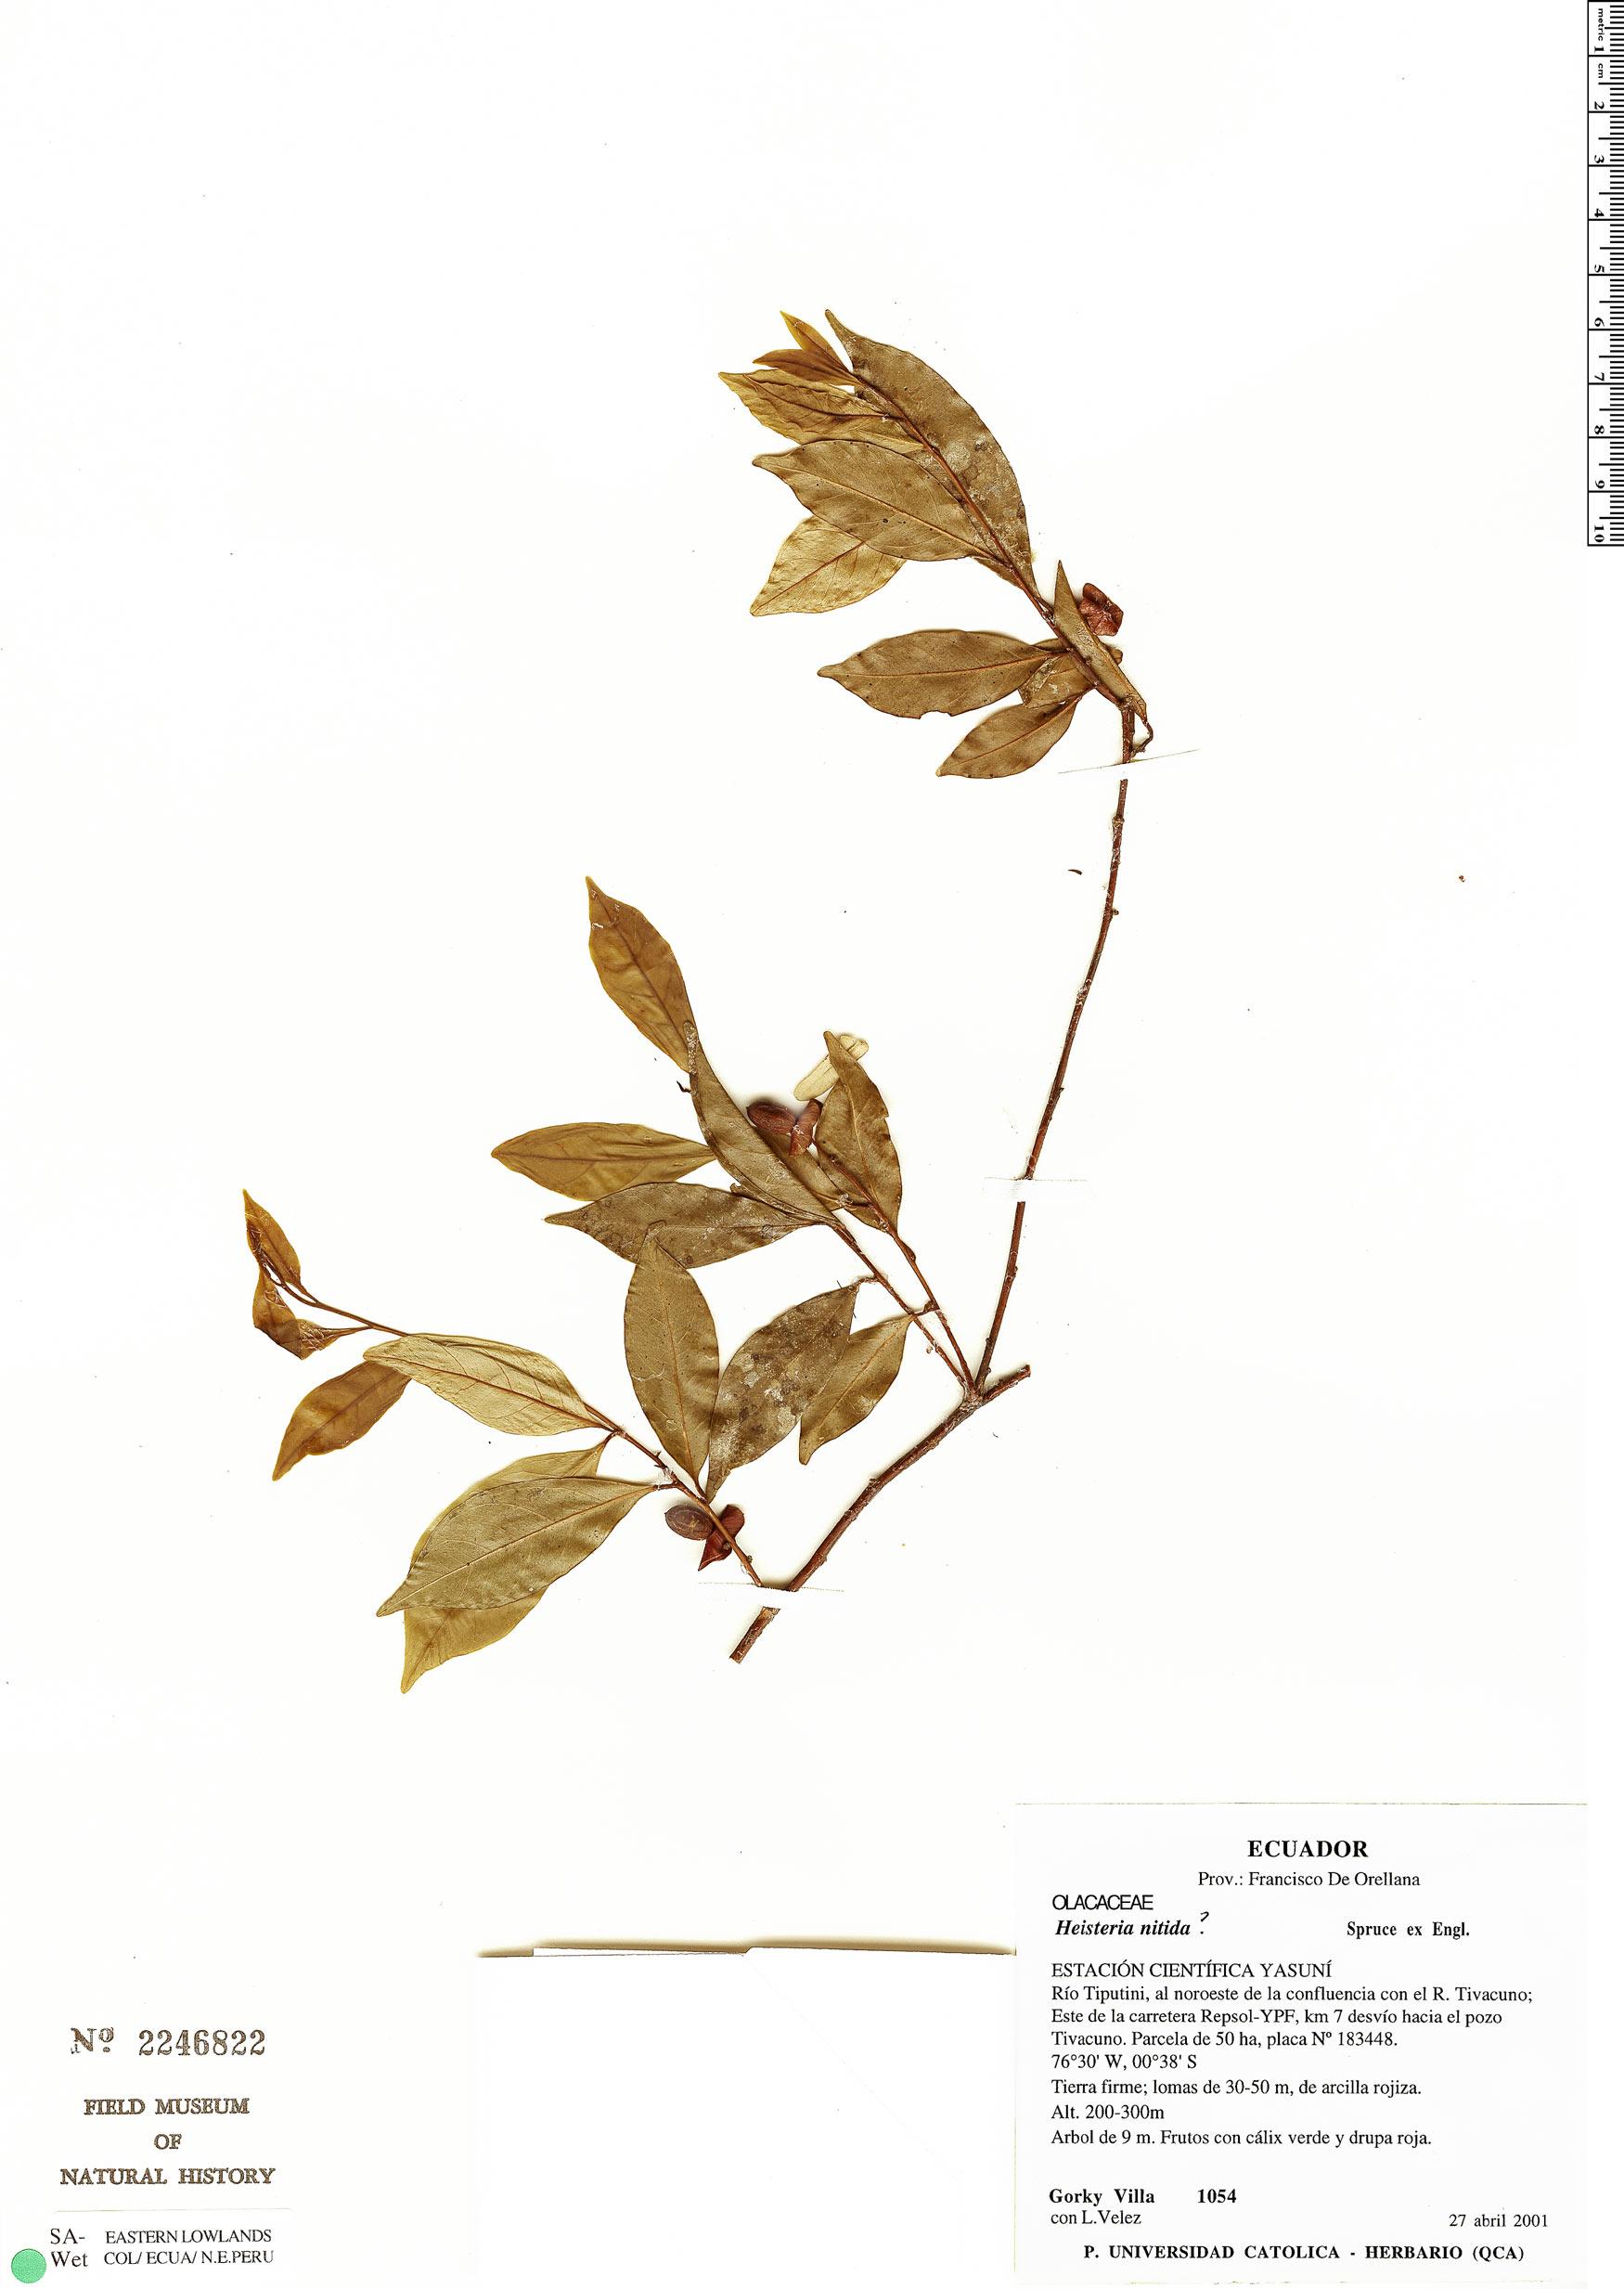 Specimen: Heisteria nitida